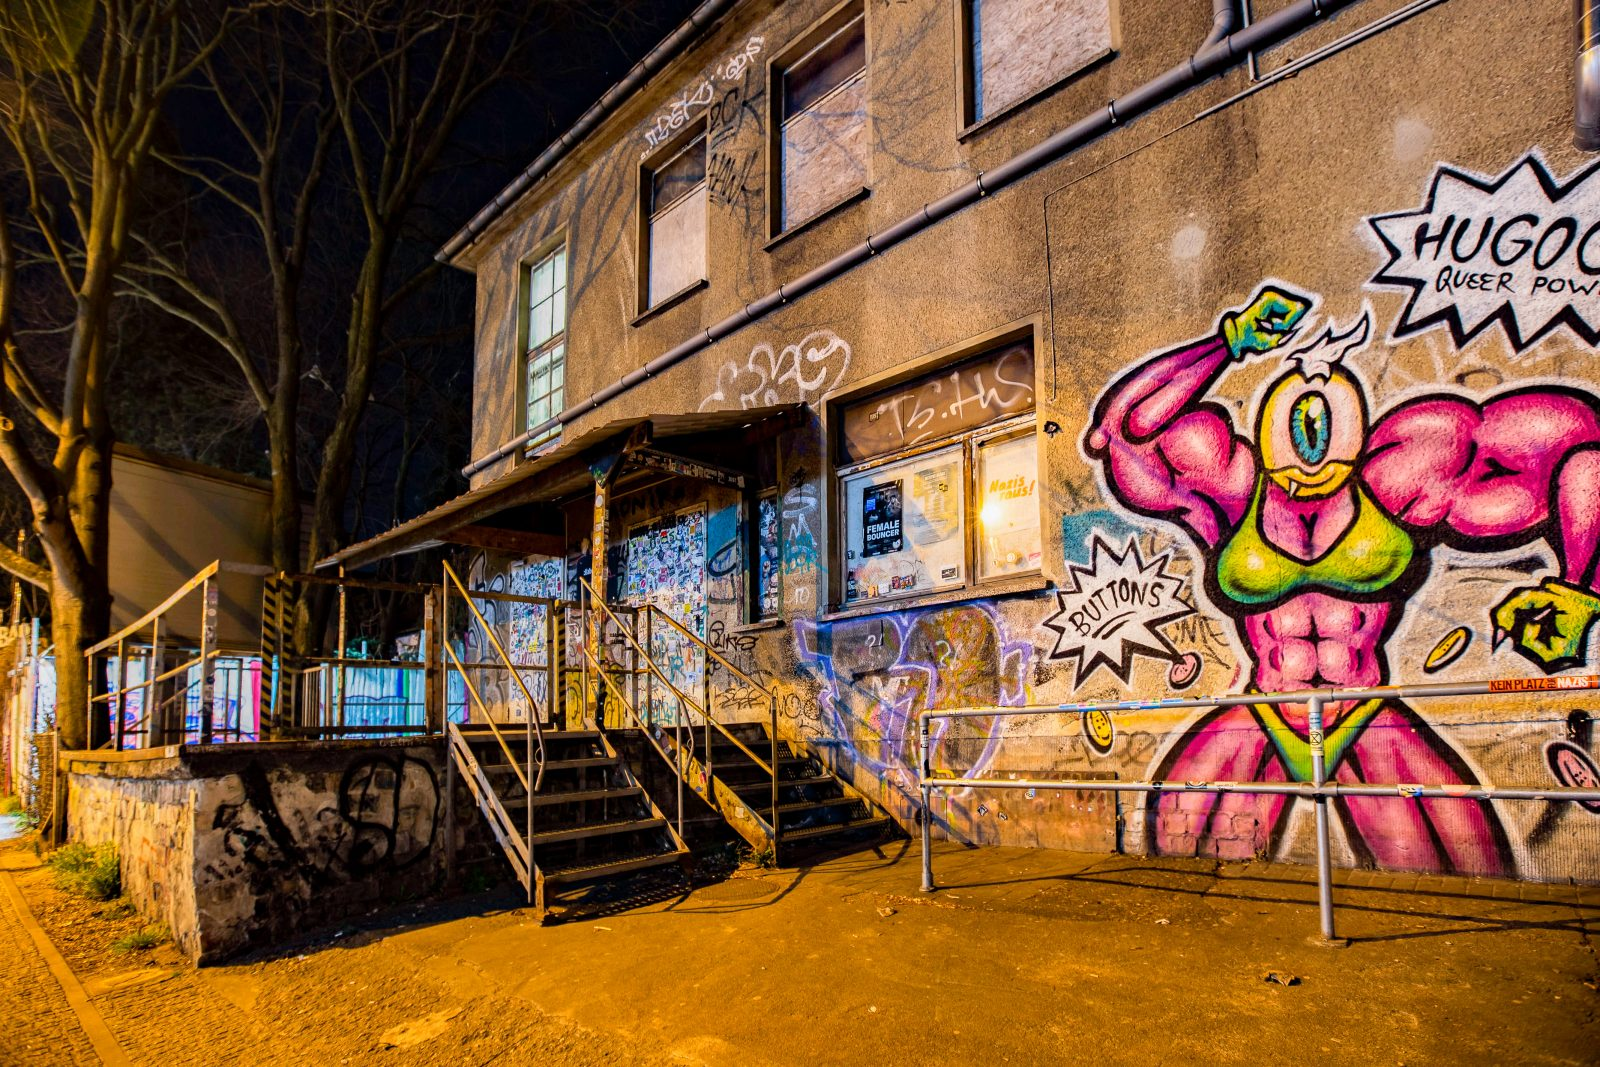 Clubs in Berlin Atonal 20 und 20 Years of Bipolar mit Lost Art ...